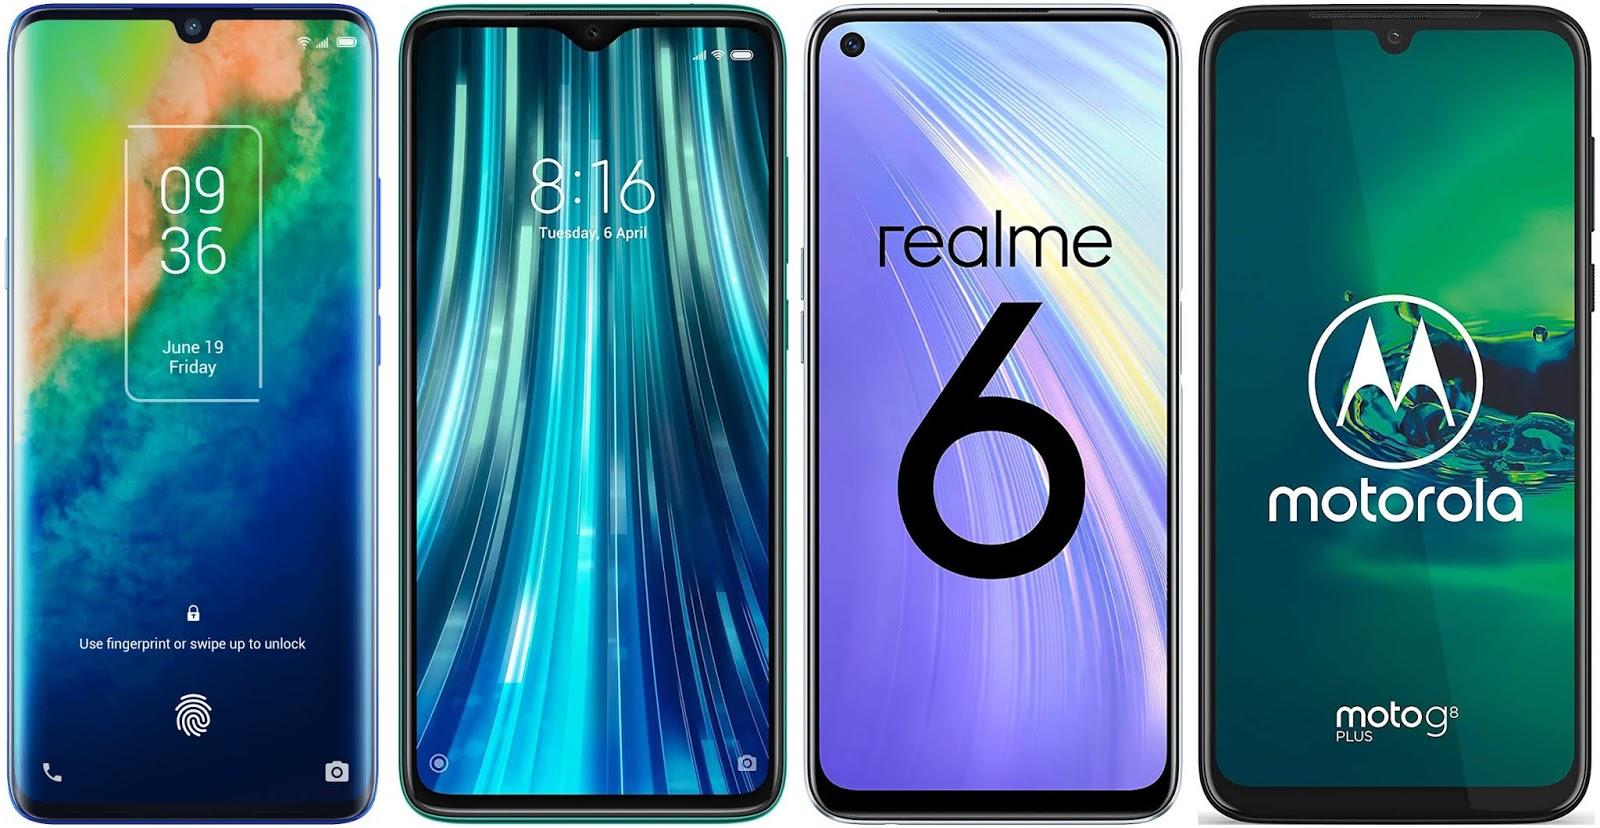 TCL 10 Plus vs Xiaomi Redmi Note 8 Pro vs Realme 6 vs Motorola Moto G8 Plus